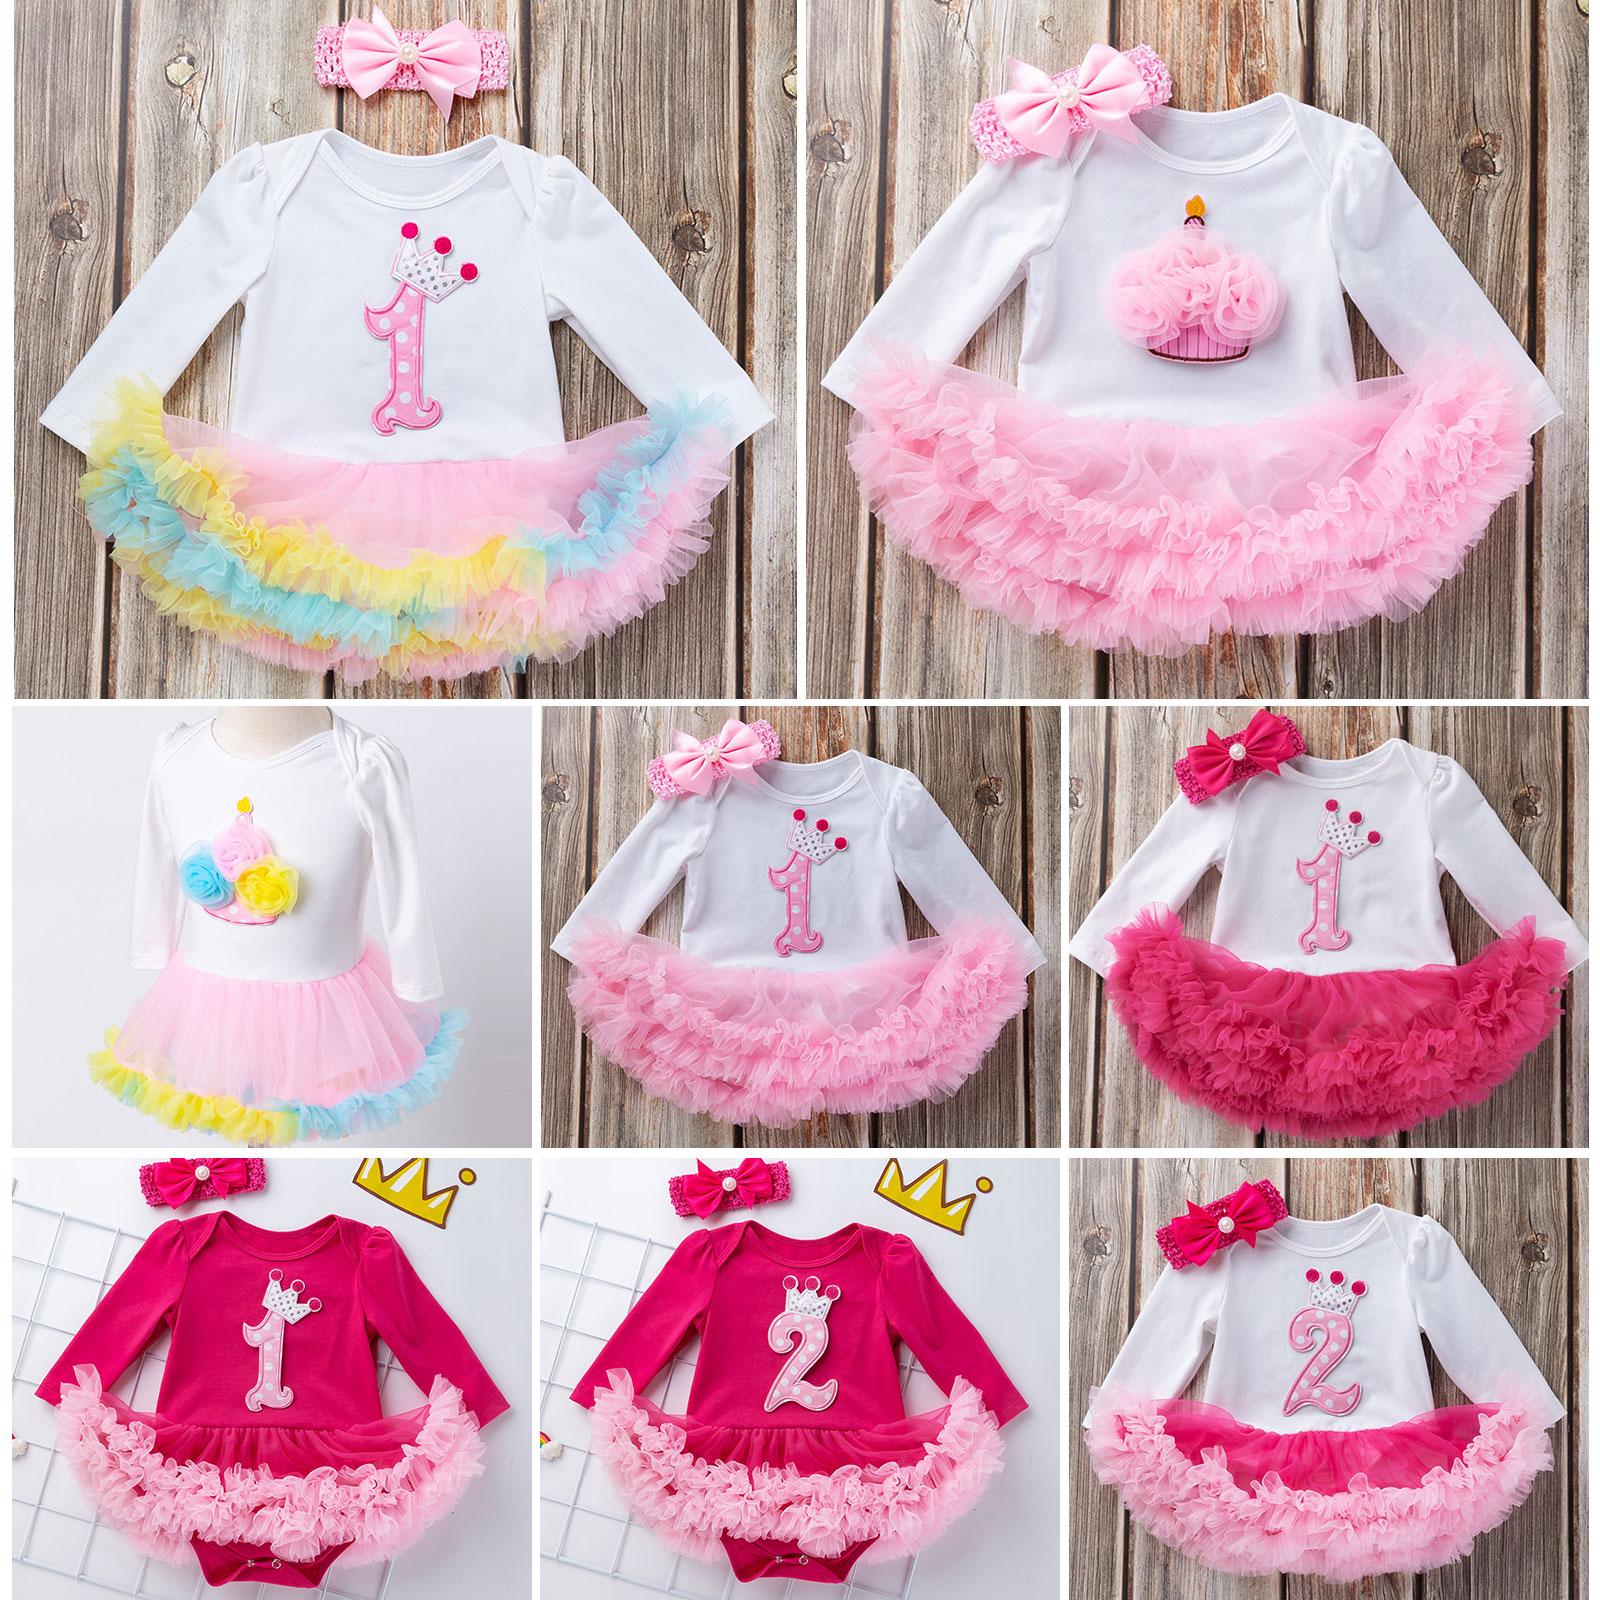 Headband Outfits Newborn Kids Birthday Clothes Set 2PCS Baby Girls Tutu Dress